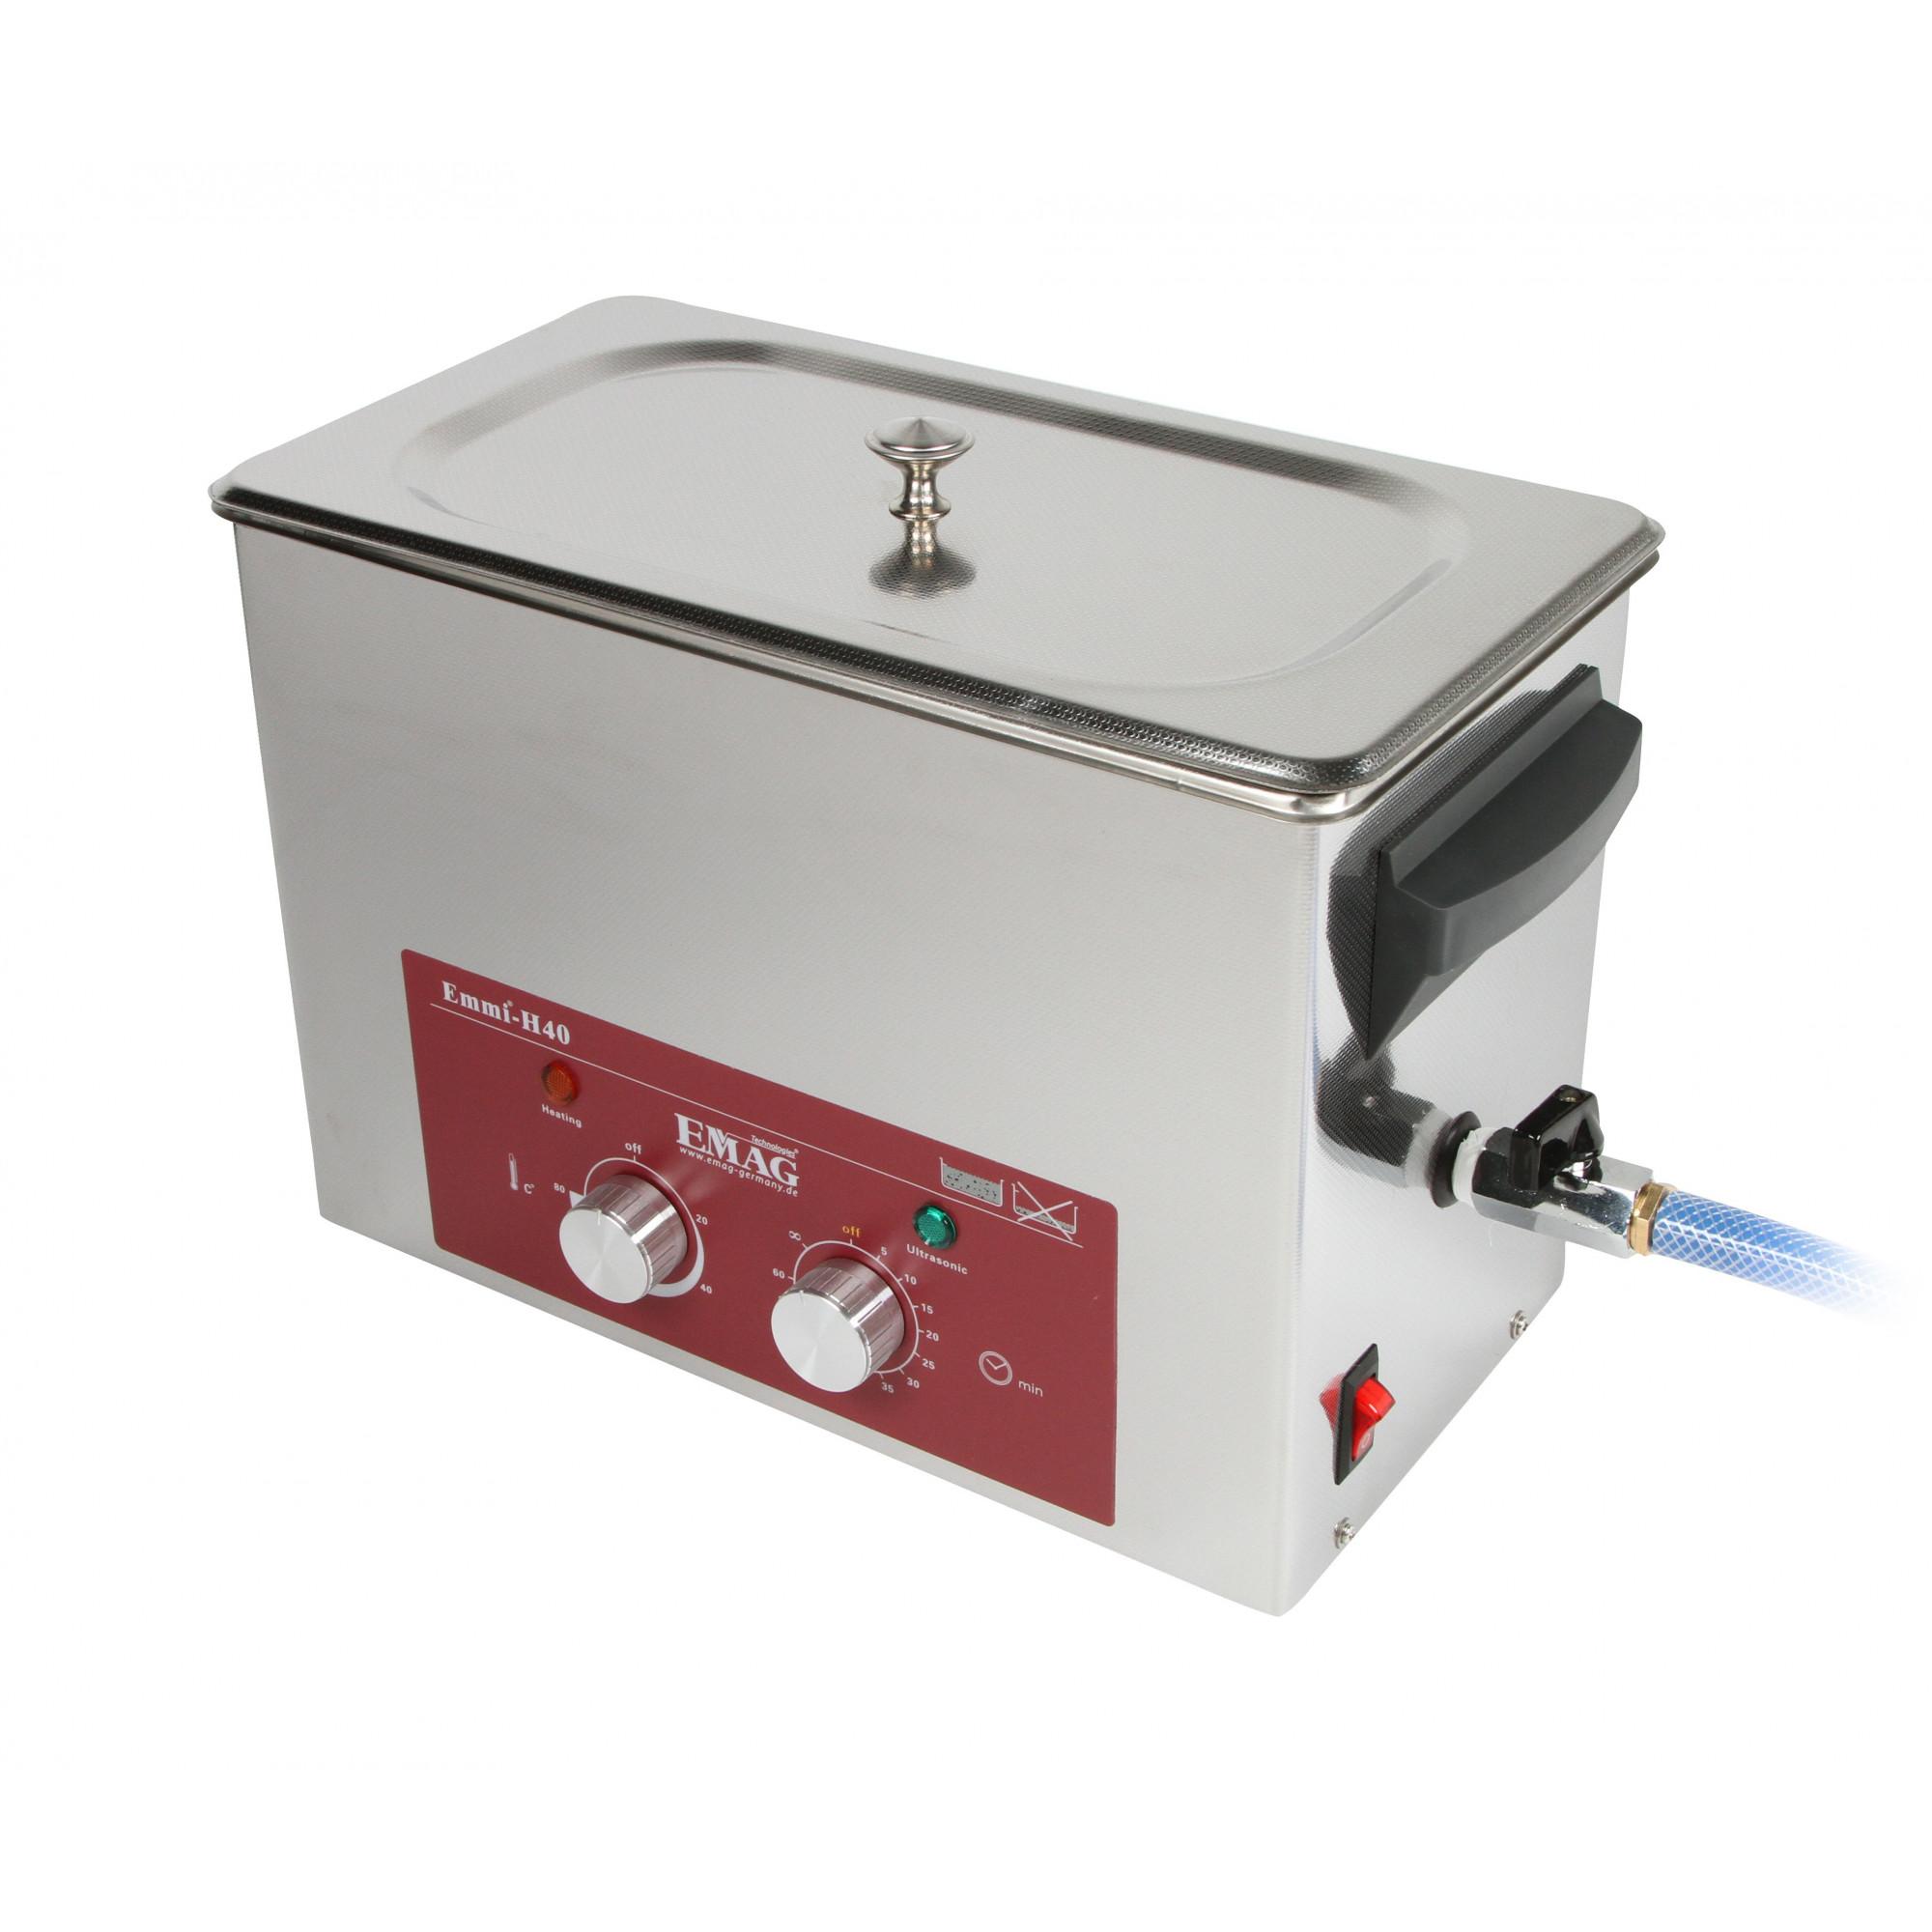 Nettoyeur à ultrasons tout en inox 4L - Emmi-H40 avec robinet de vidange